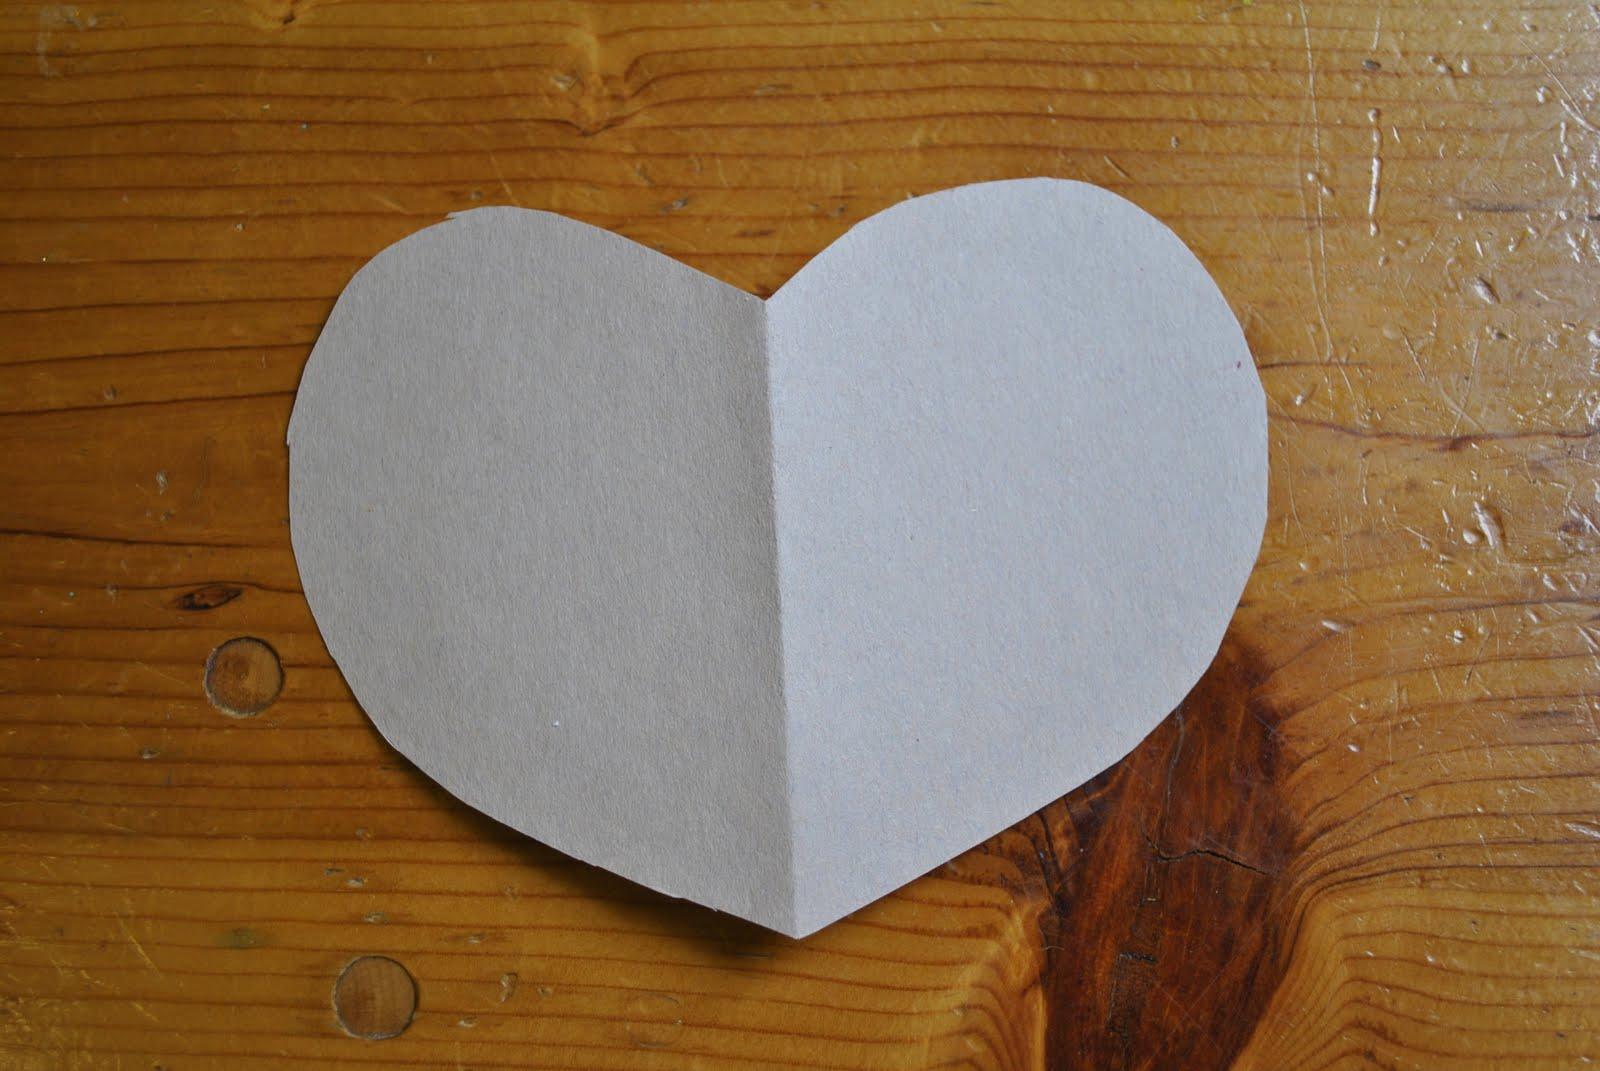 Construciton Paper Heart